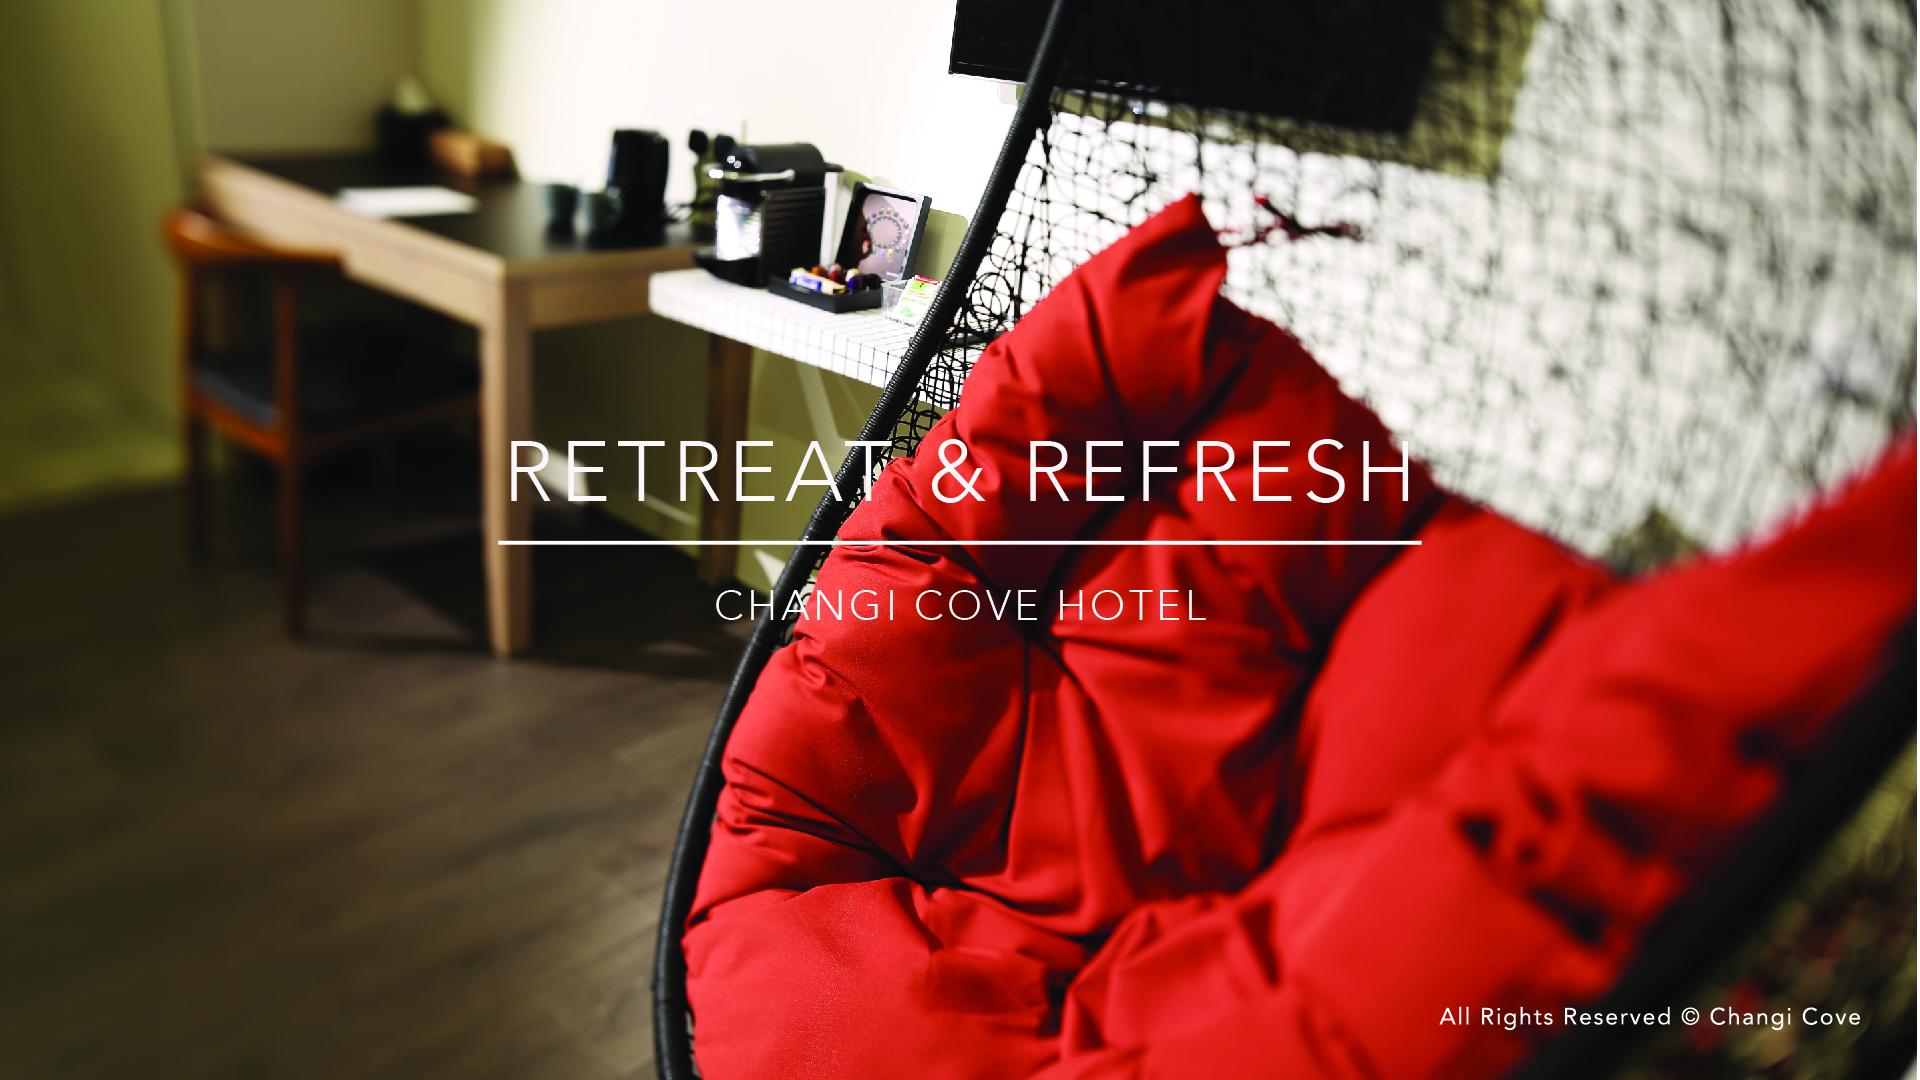 Retreat & Refuel